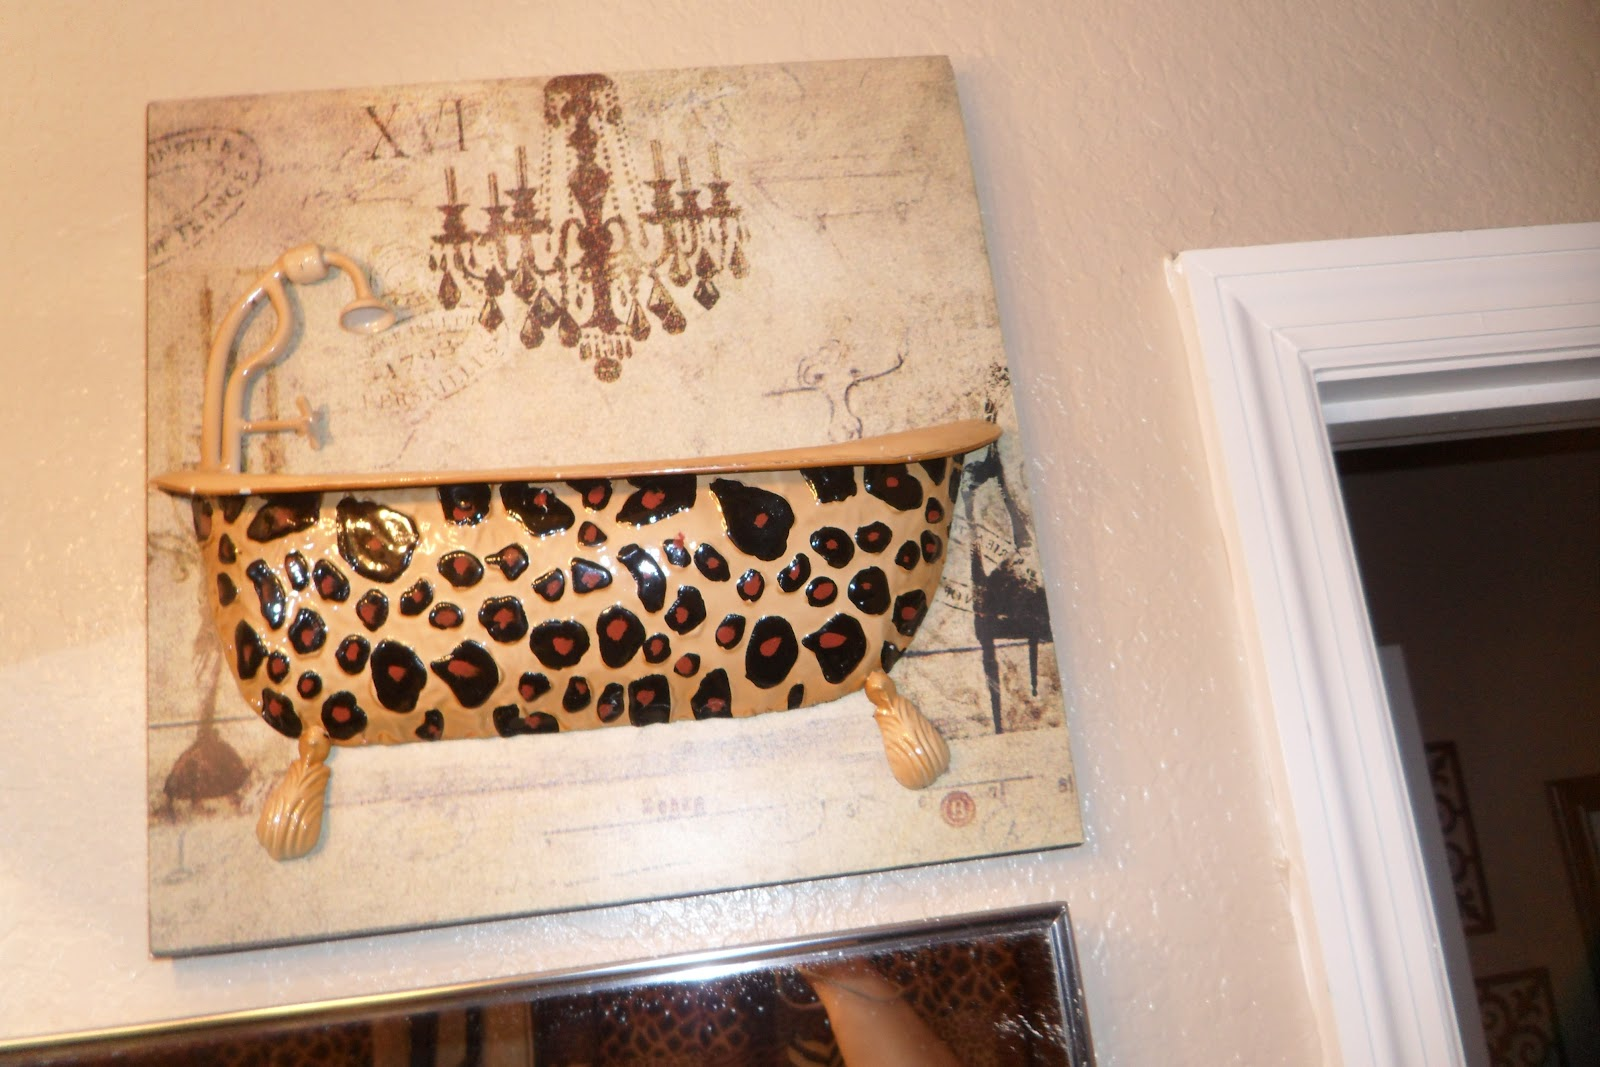 Cheetah Print Decor Zebra Print Room Decorations Accessories Easy Zebra Print Living